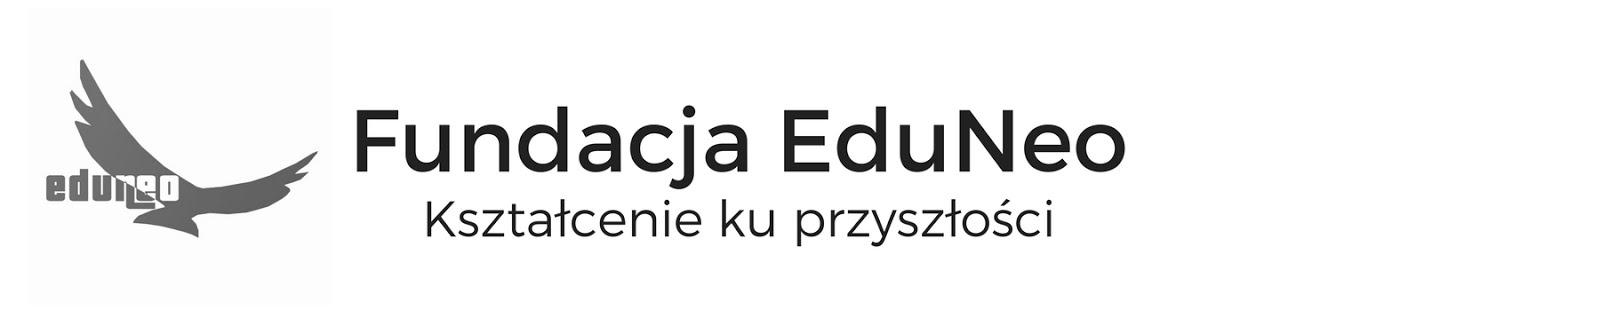 Fundacja EduNeo